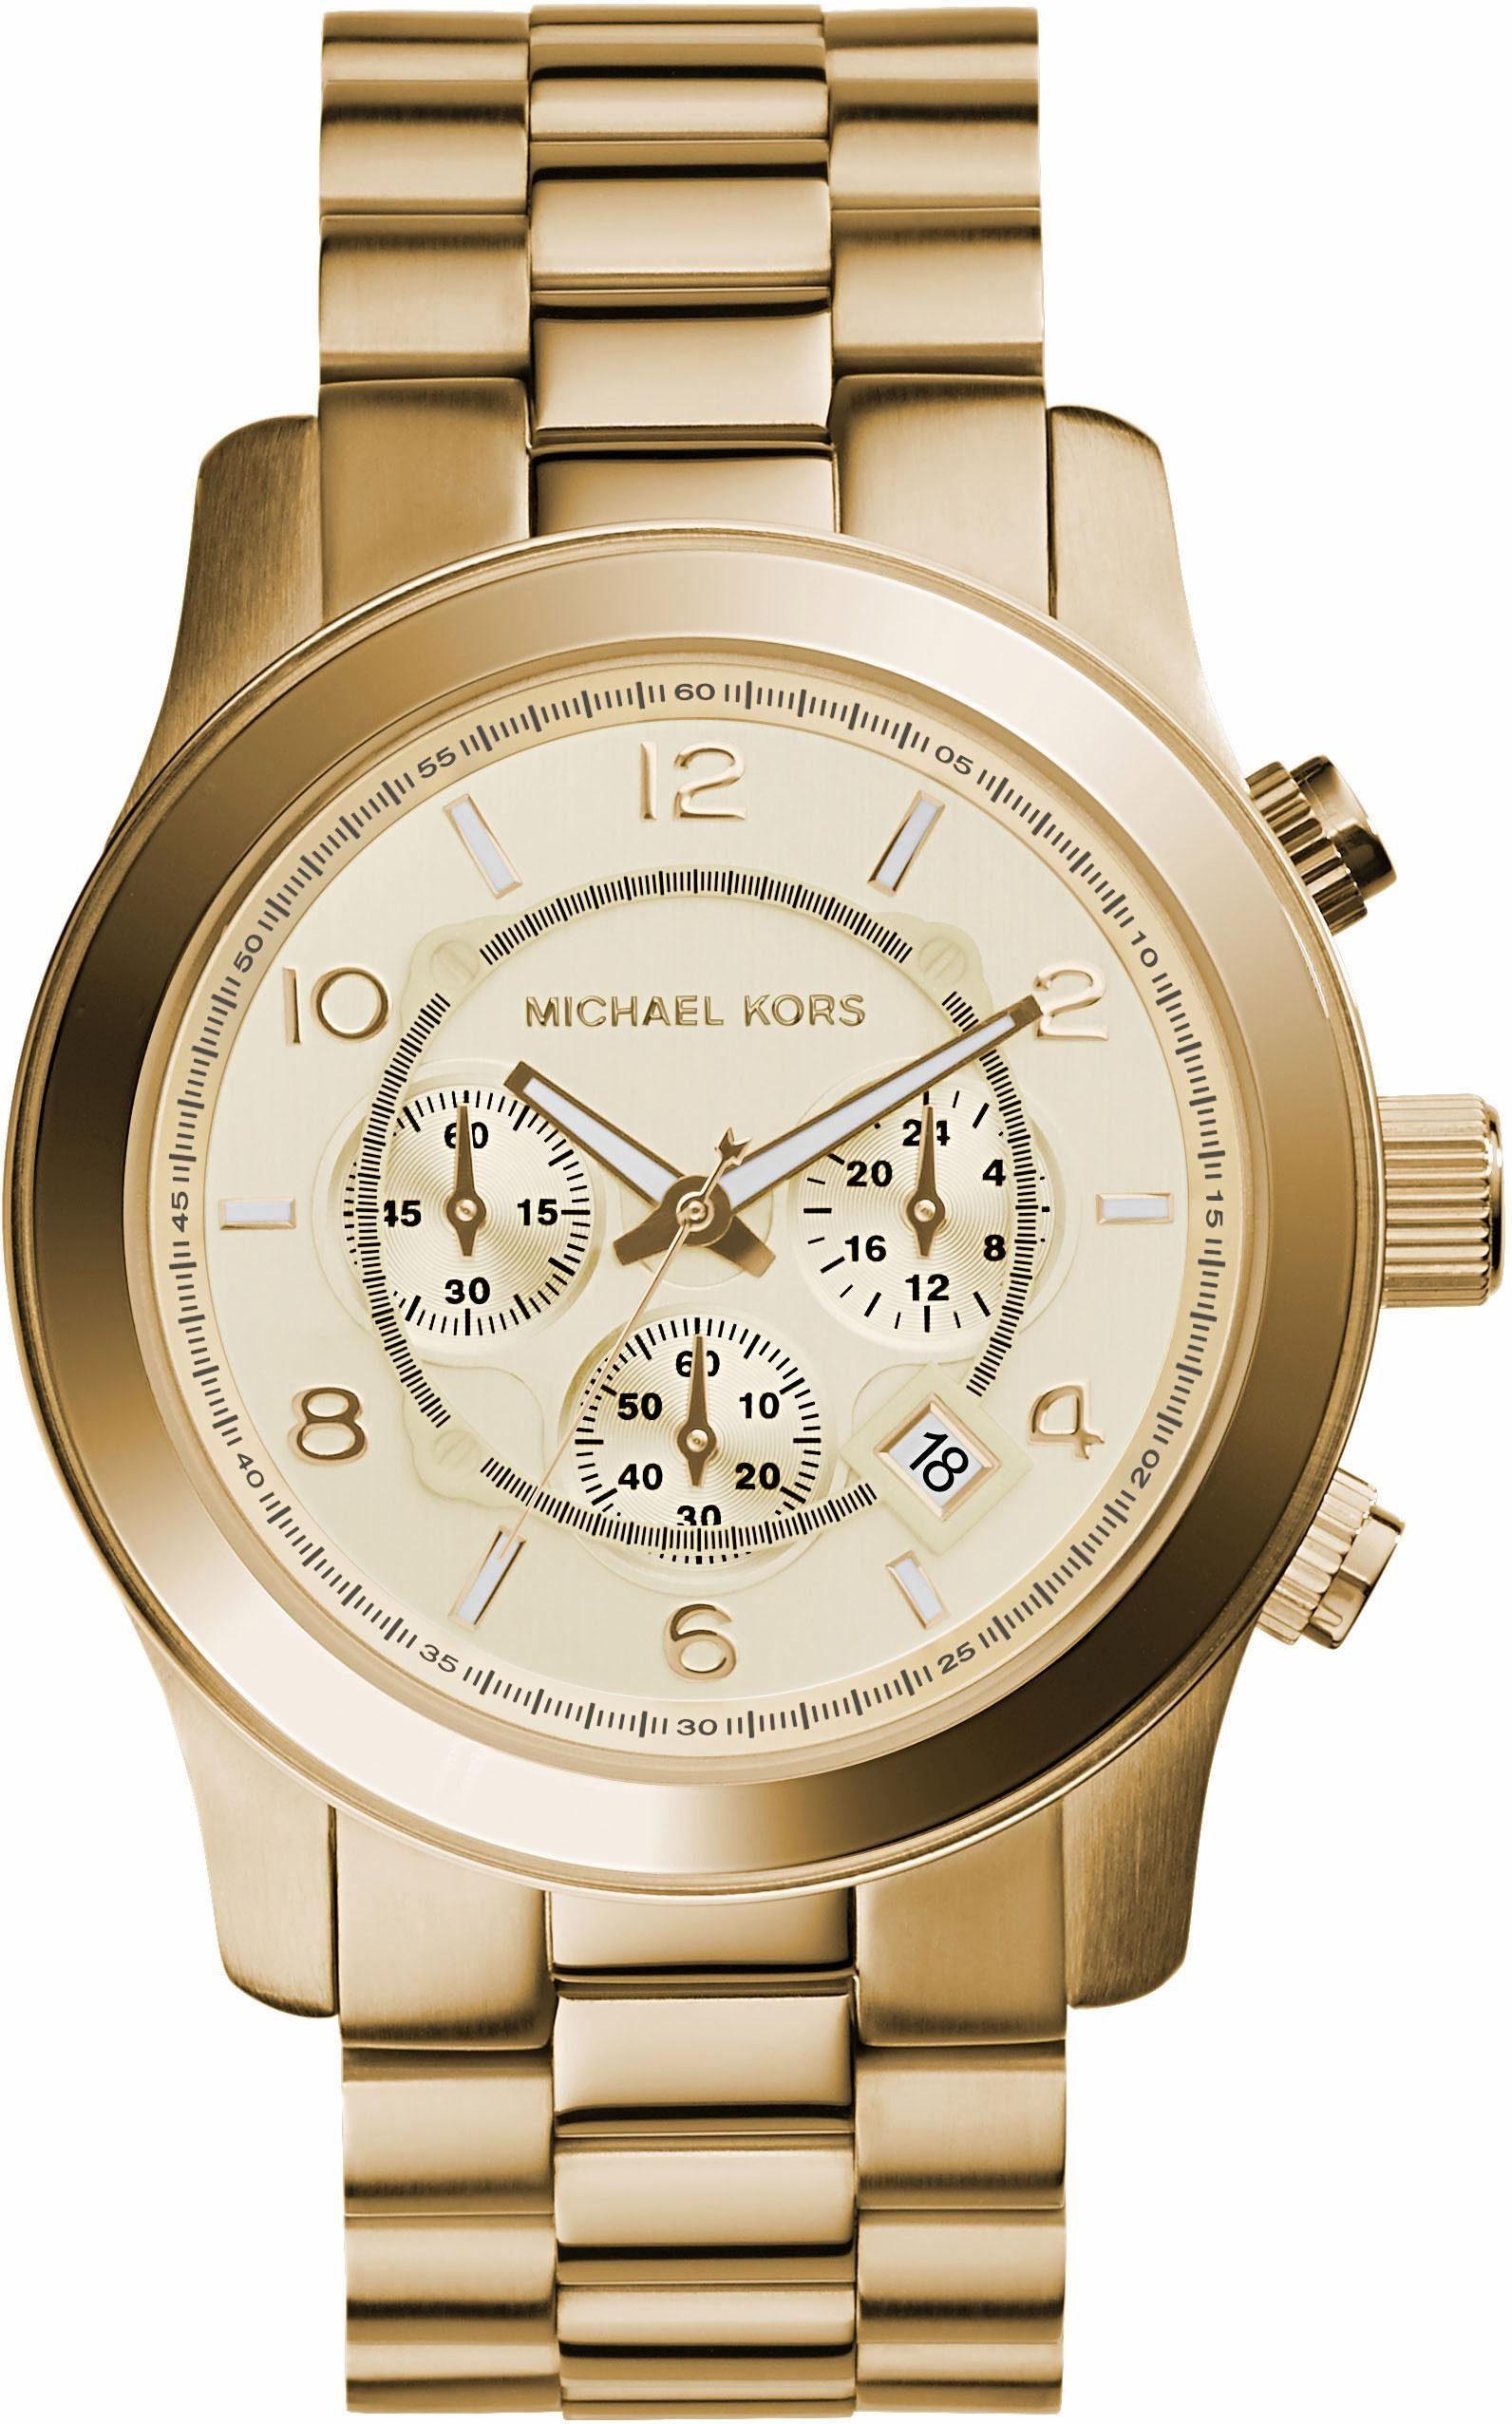 MICHAEL KORS Chronograph »RUNWAY, MK8077«